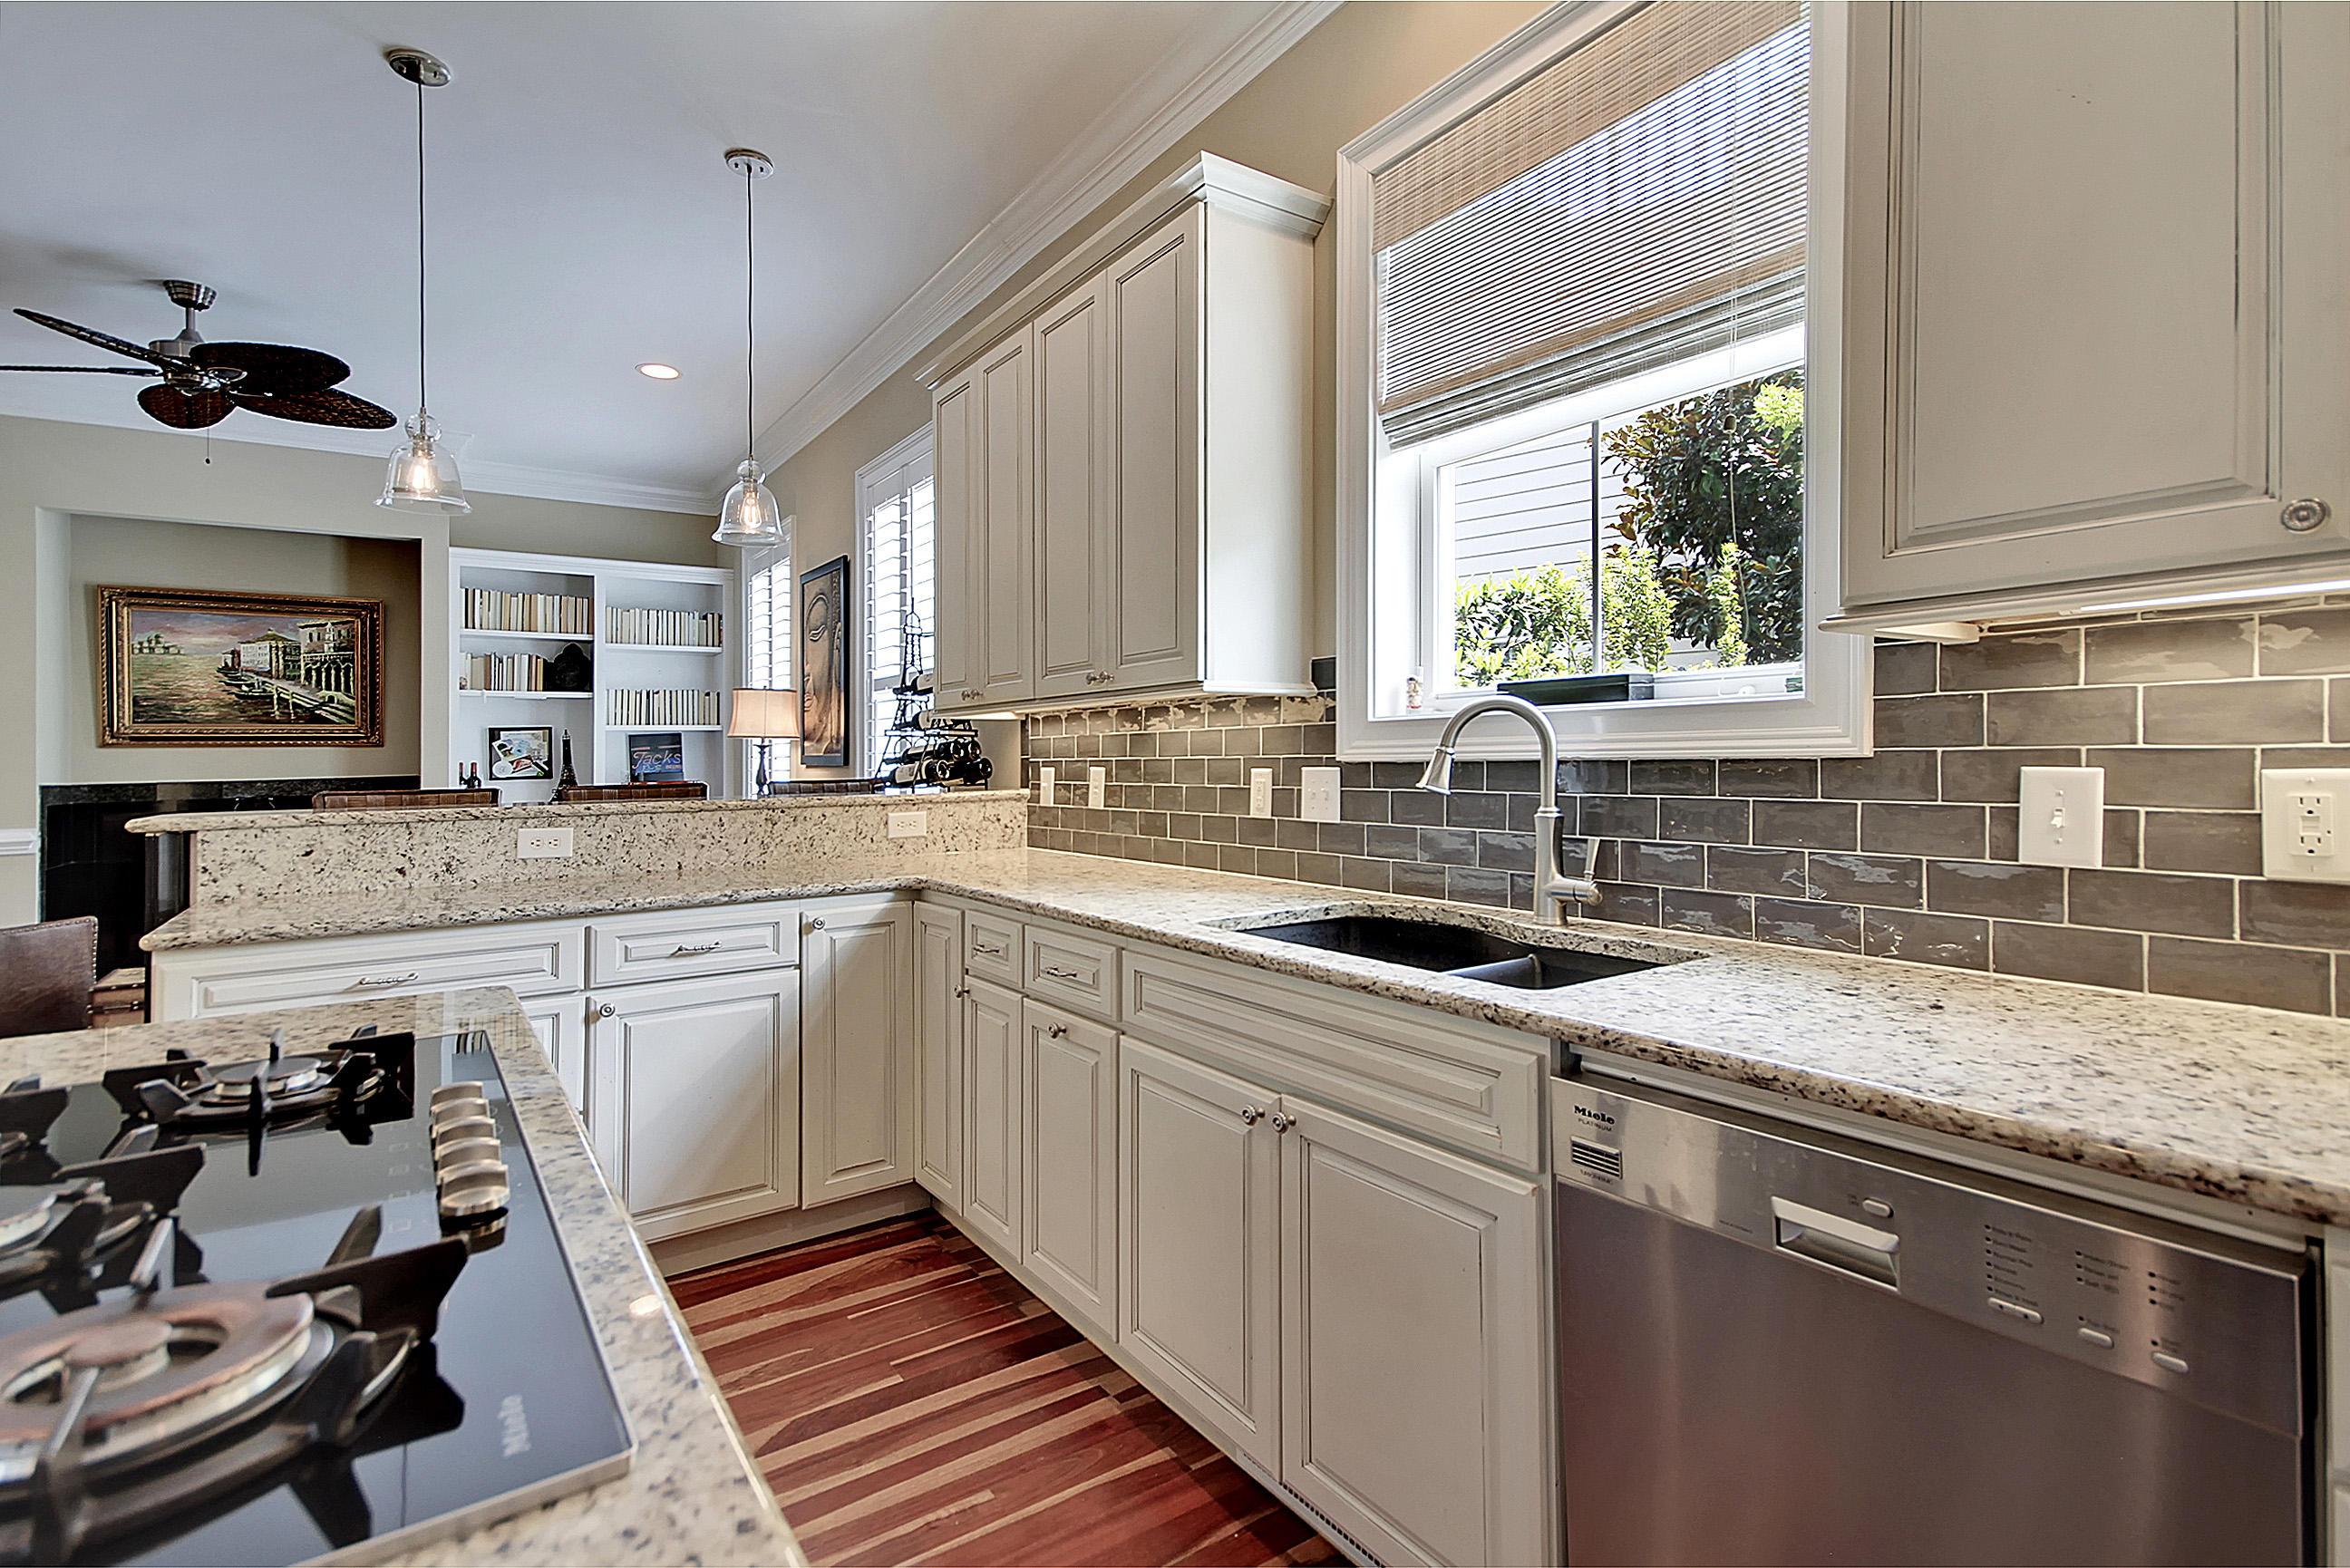 Belle Hall Homes For Sale - 368 Evian, Mount Pleasant, SC - 9